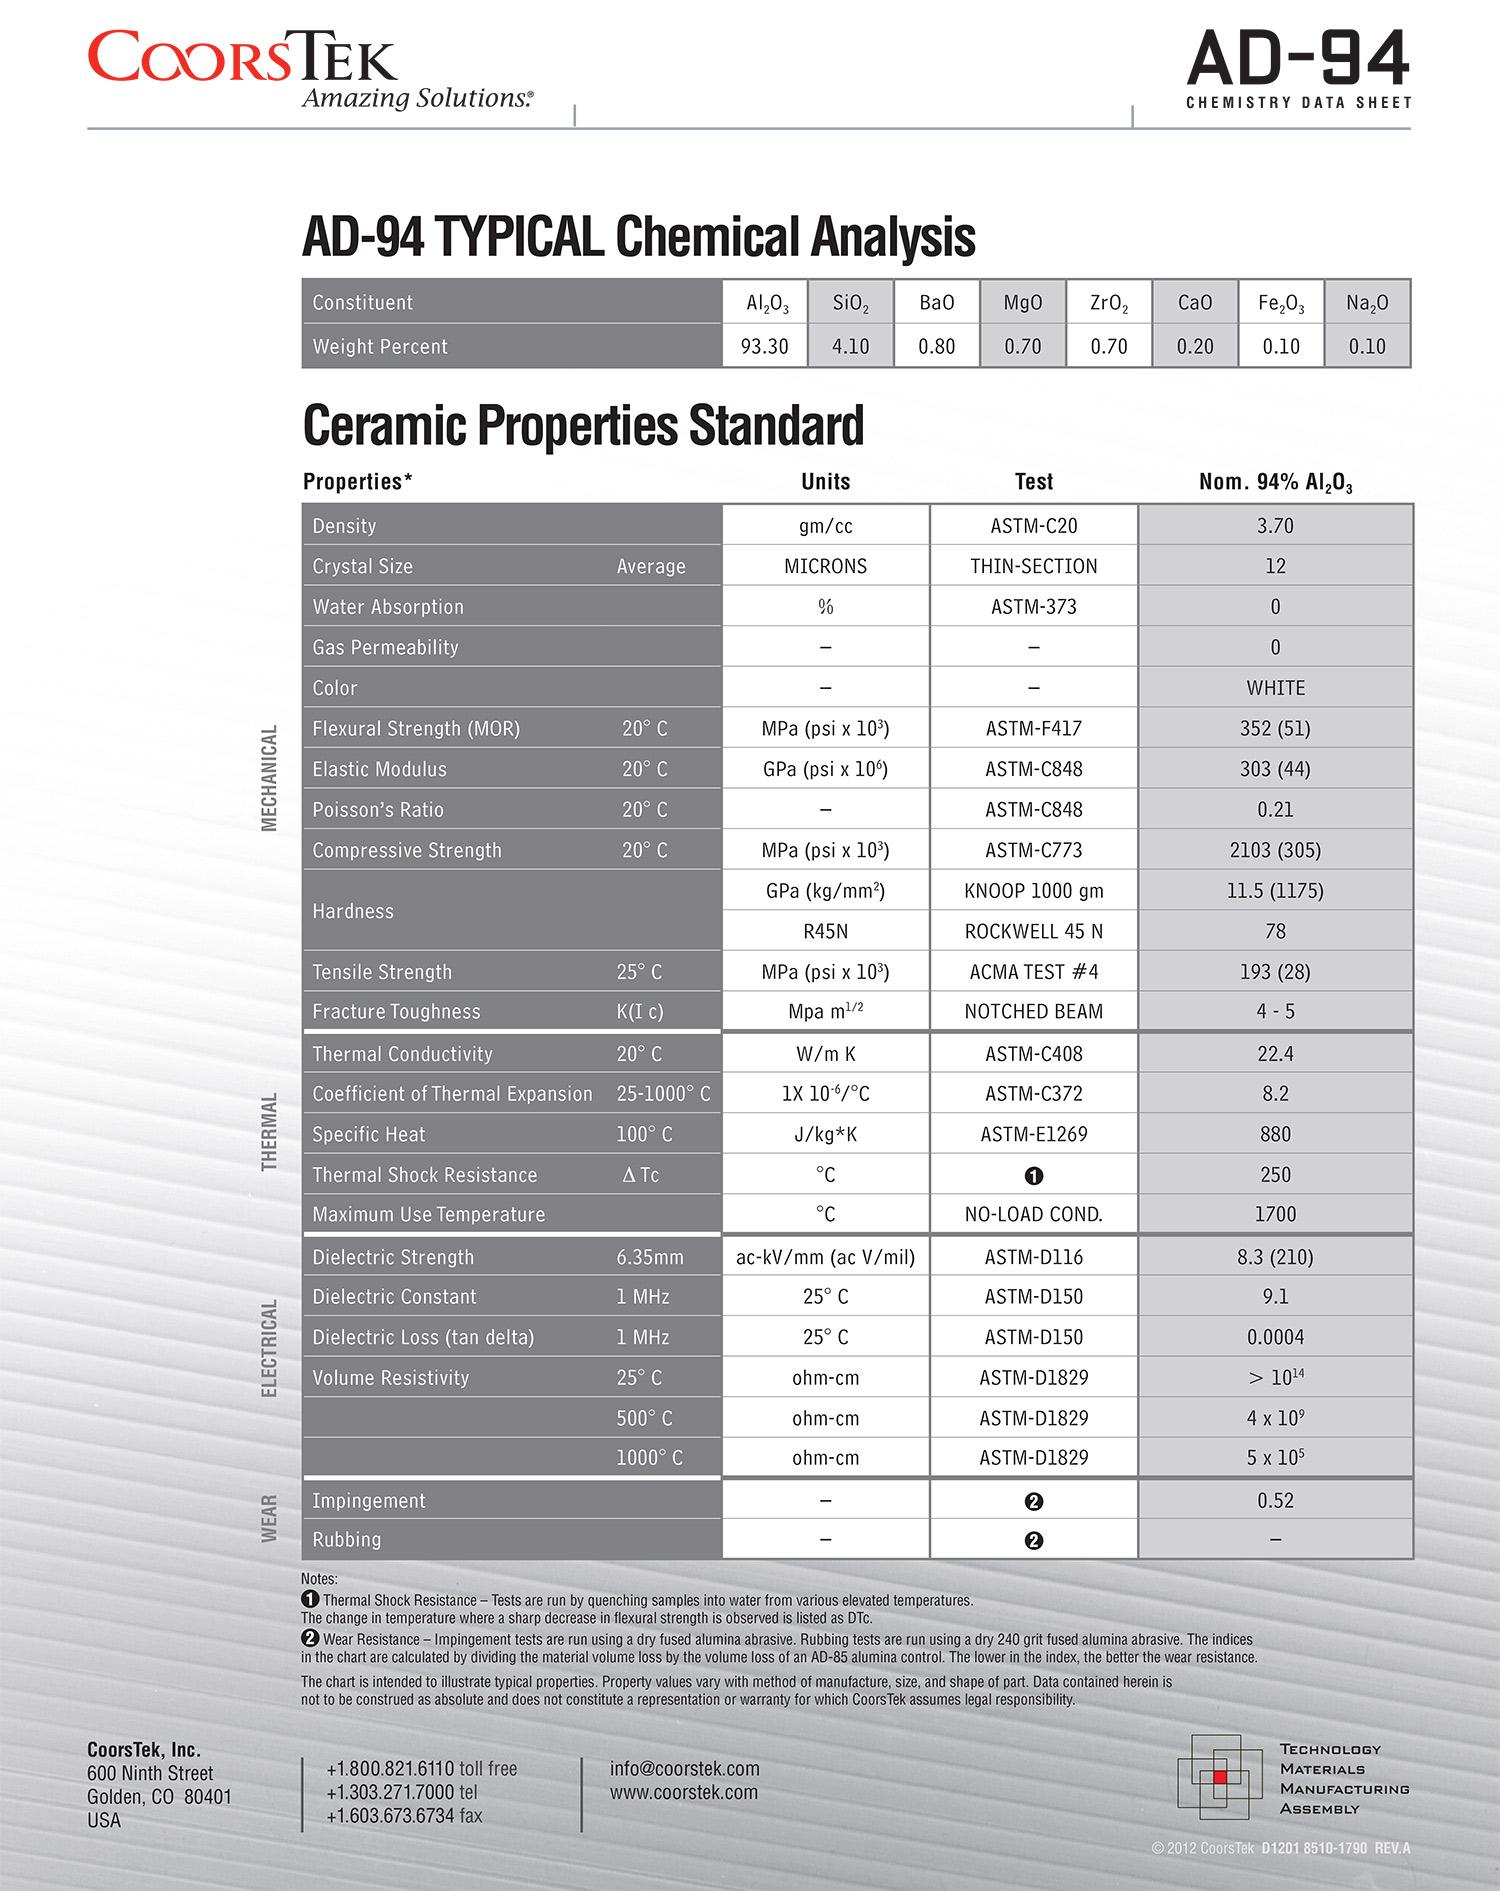 8510-1790-AD-94-9th-St-Materials-Properties-Sheets